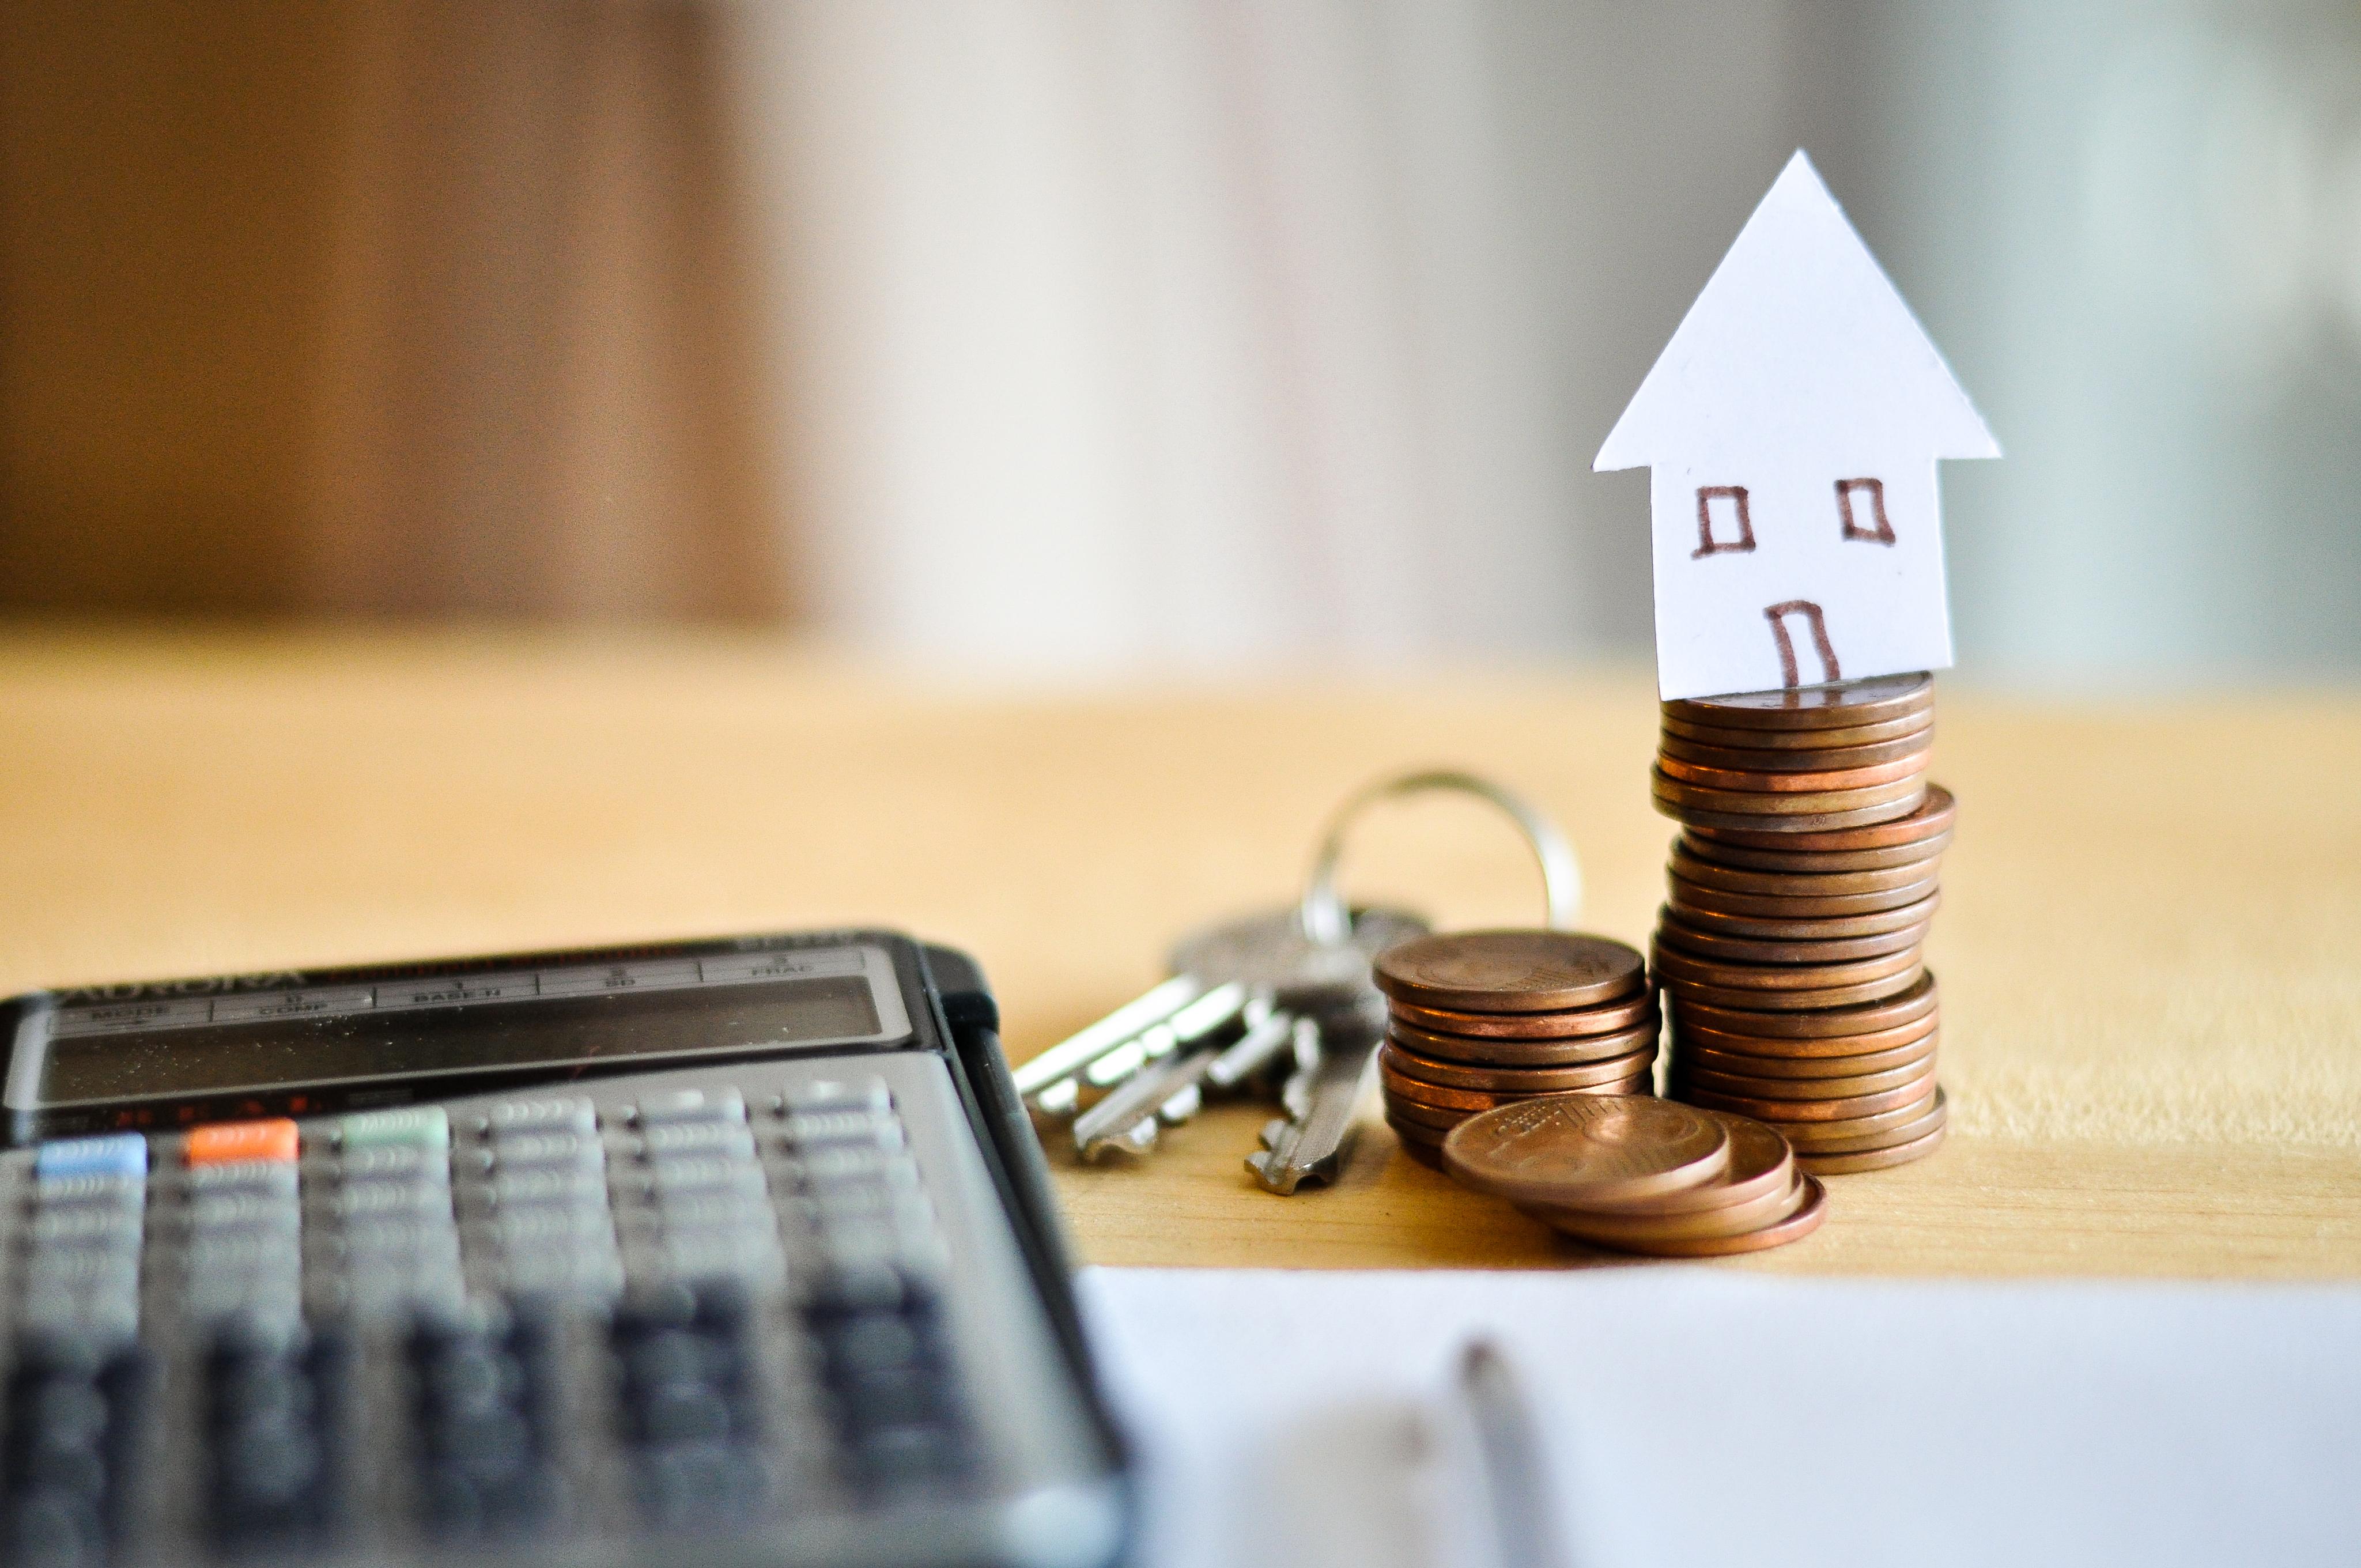 wohnung immobilienwert ermitteln 11880. Black Bedroom Furniture Sets. Home Design Ideas